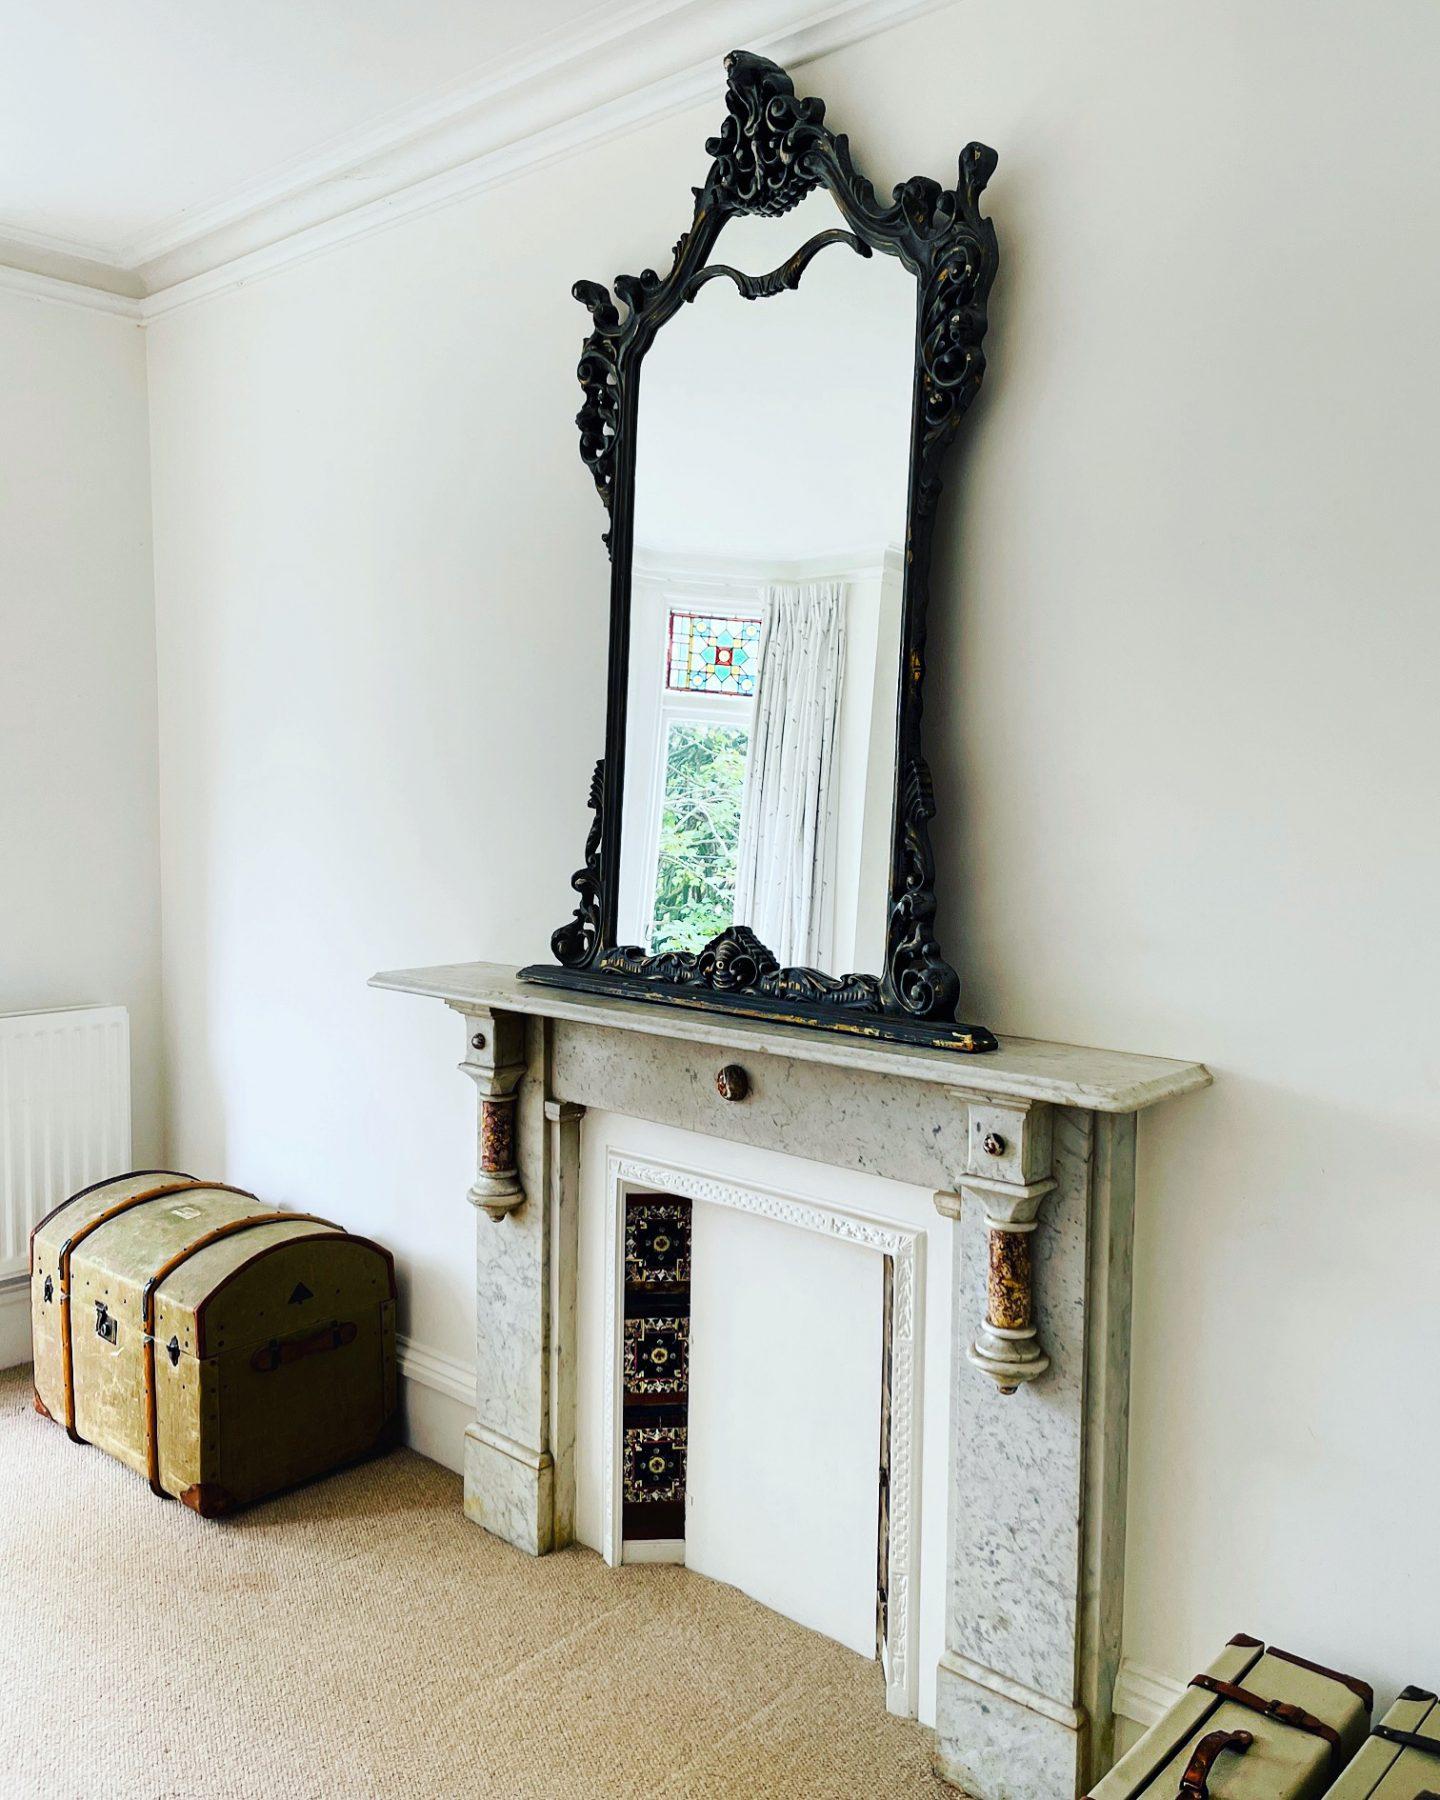 Victorian gothic semi detached house - the guest bedroom. Owned by Jp Clark @jpslifeandloves jpslifeandloves.com